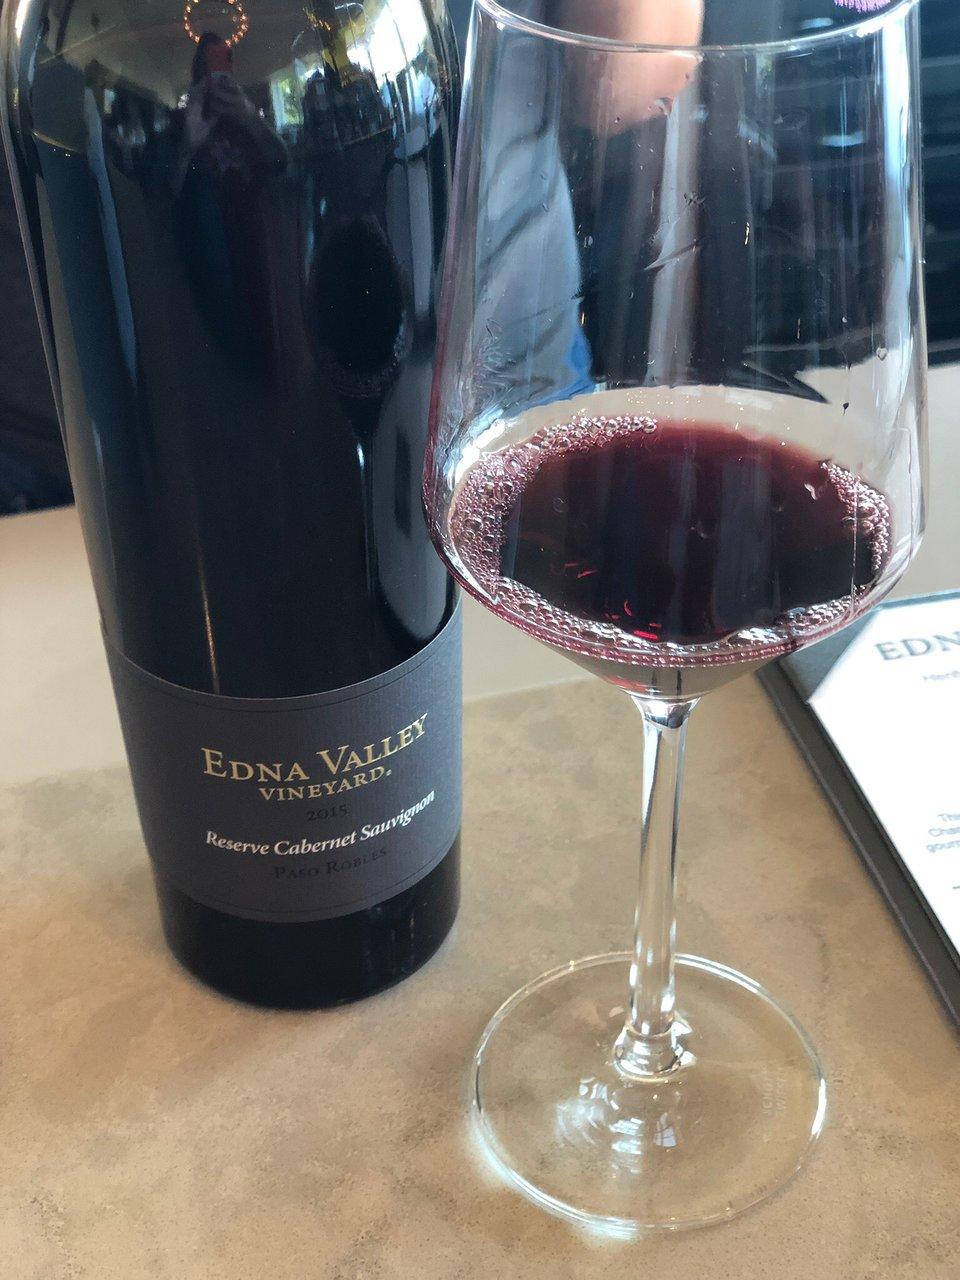 Edna Valley Vineyard San Luis Obispo 2020 All You Need To Know Before You Go With Photos Tripadvisor